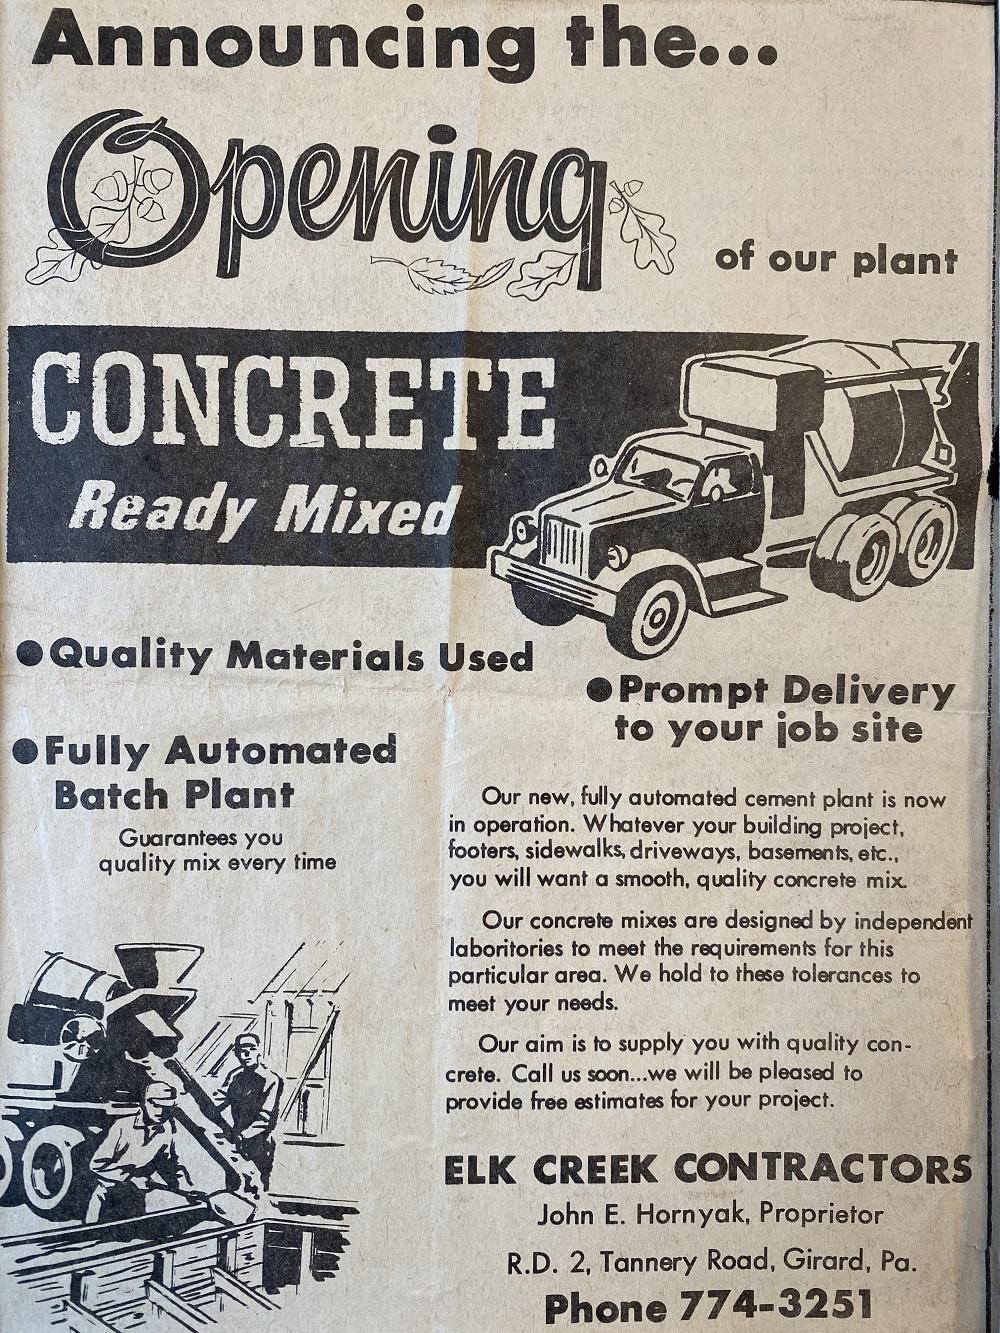 concrete-services-corp-history.jpg